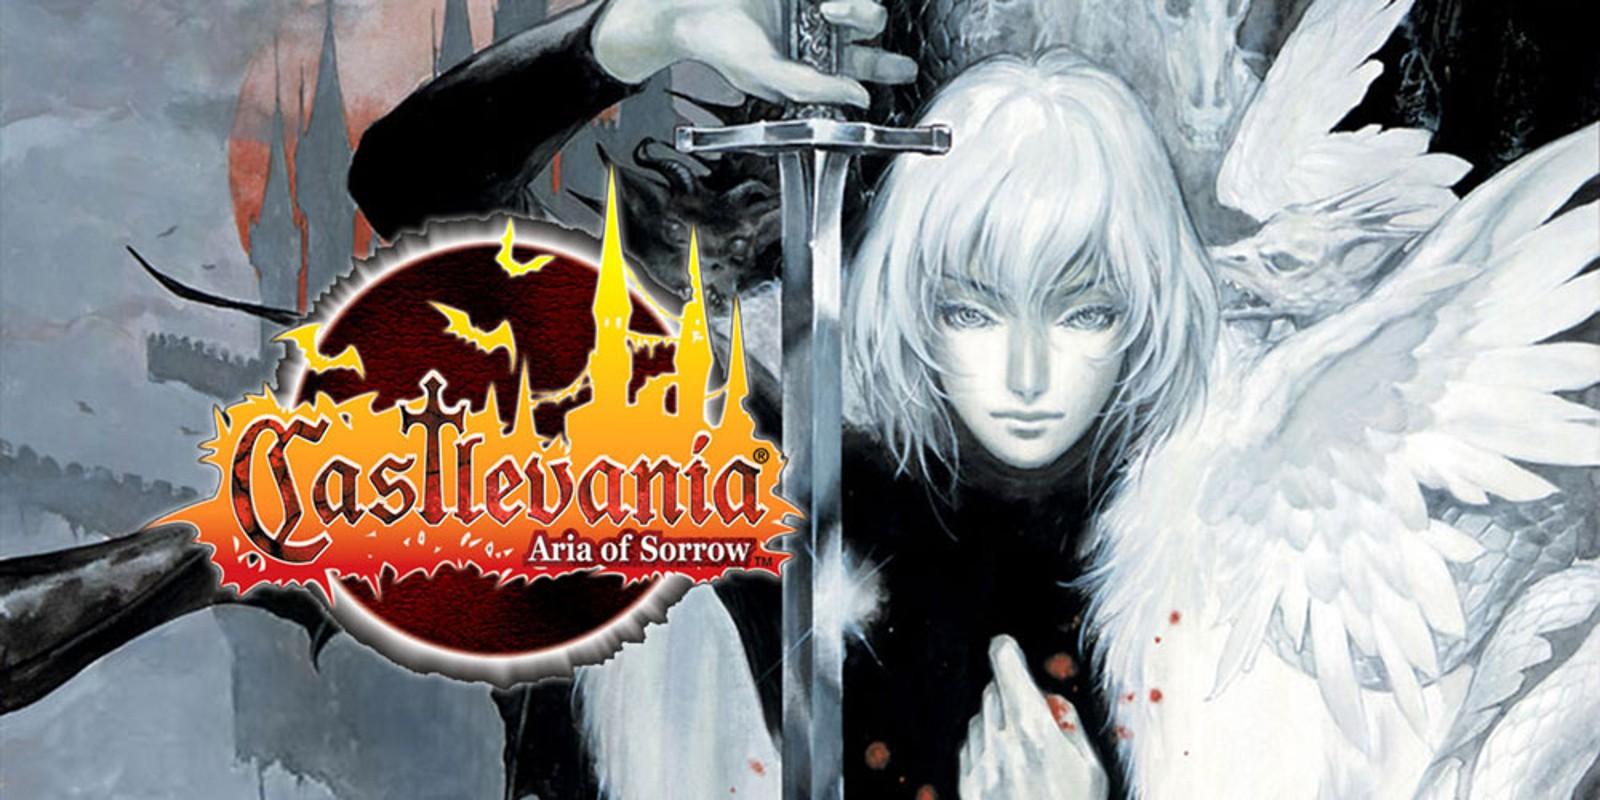 Koji Igarashi on why Castlevania: Aria of Sorrow was made for GBA